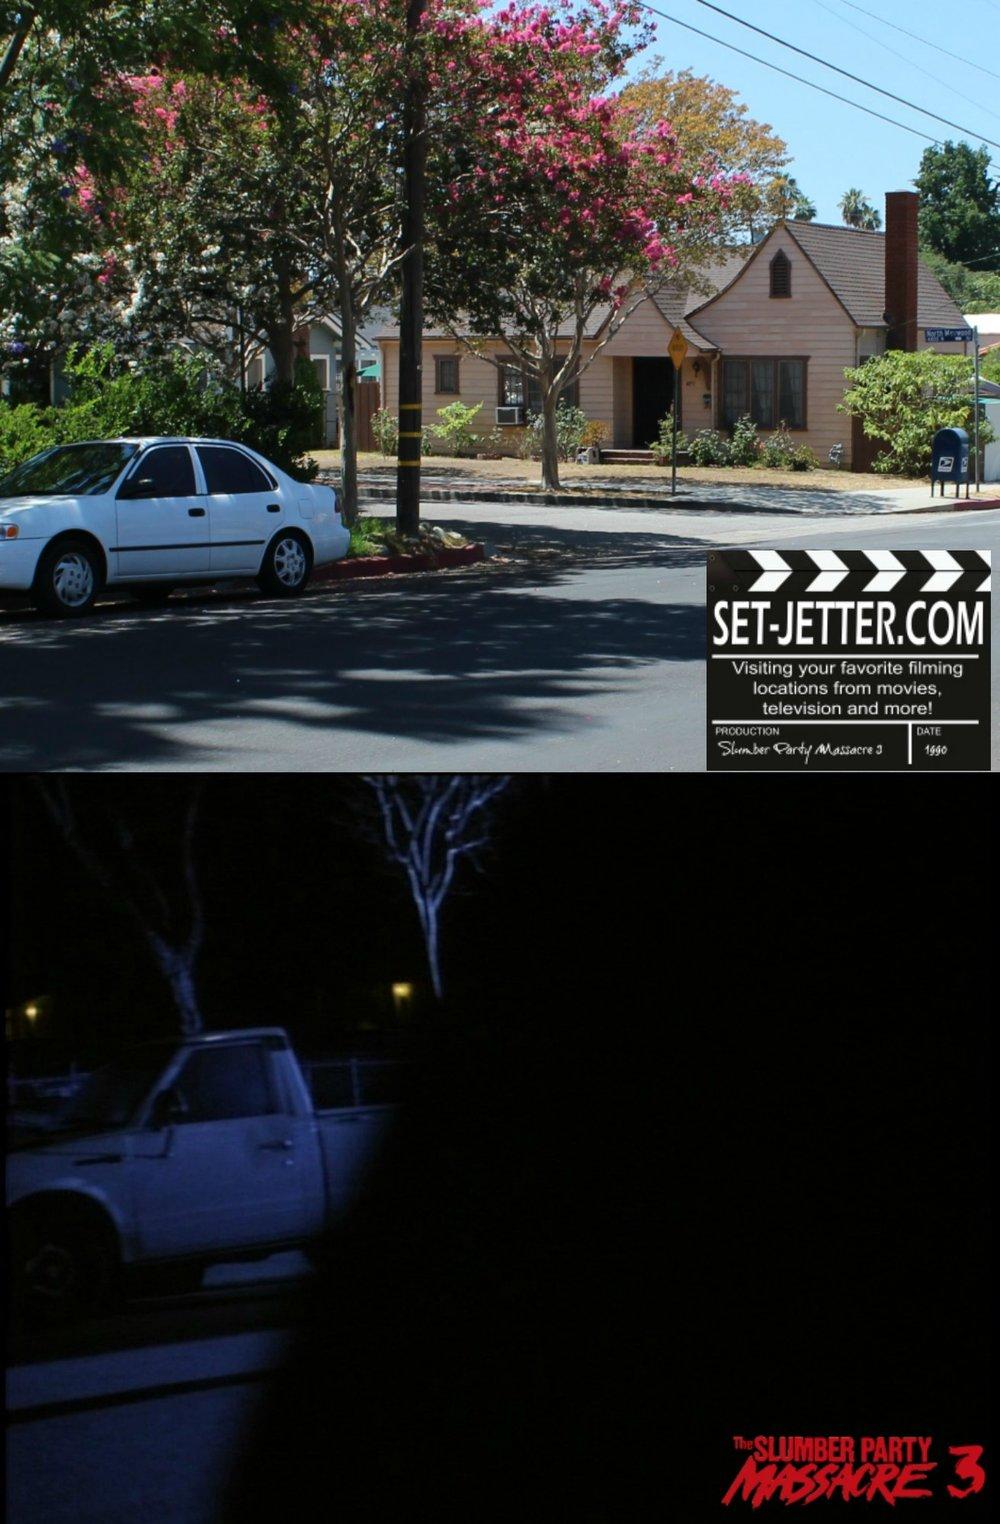 Slumber Party Massacre III comparison 165.jpg